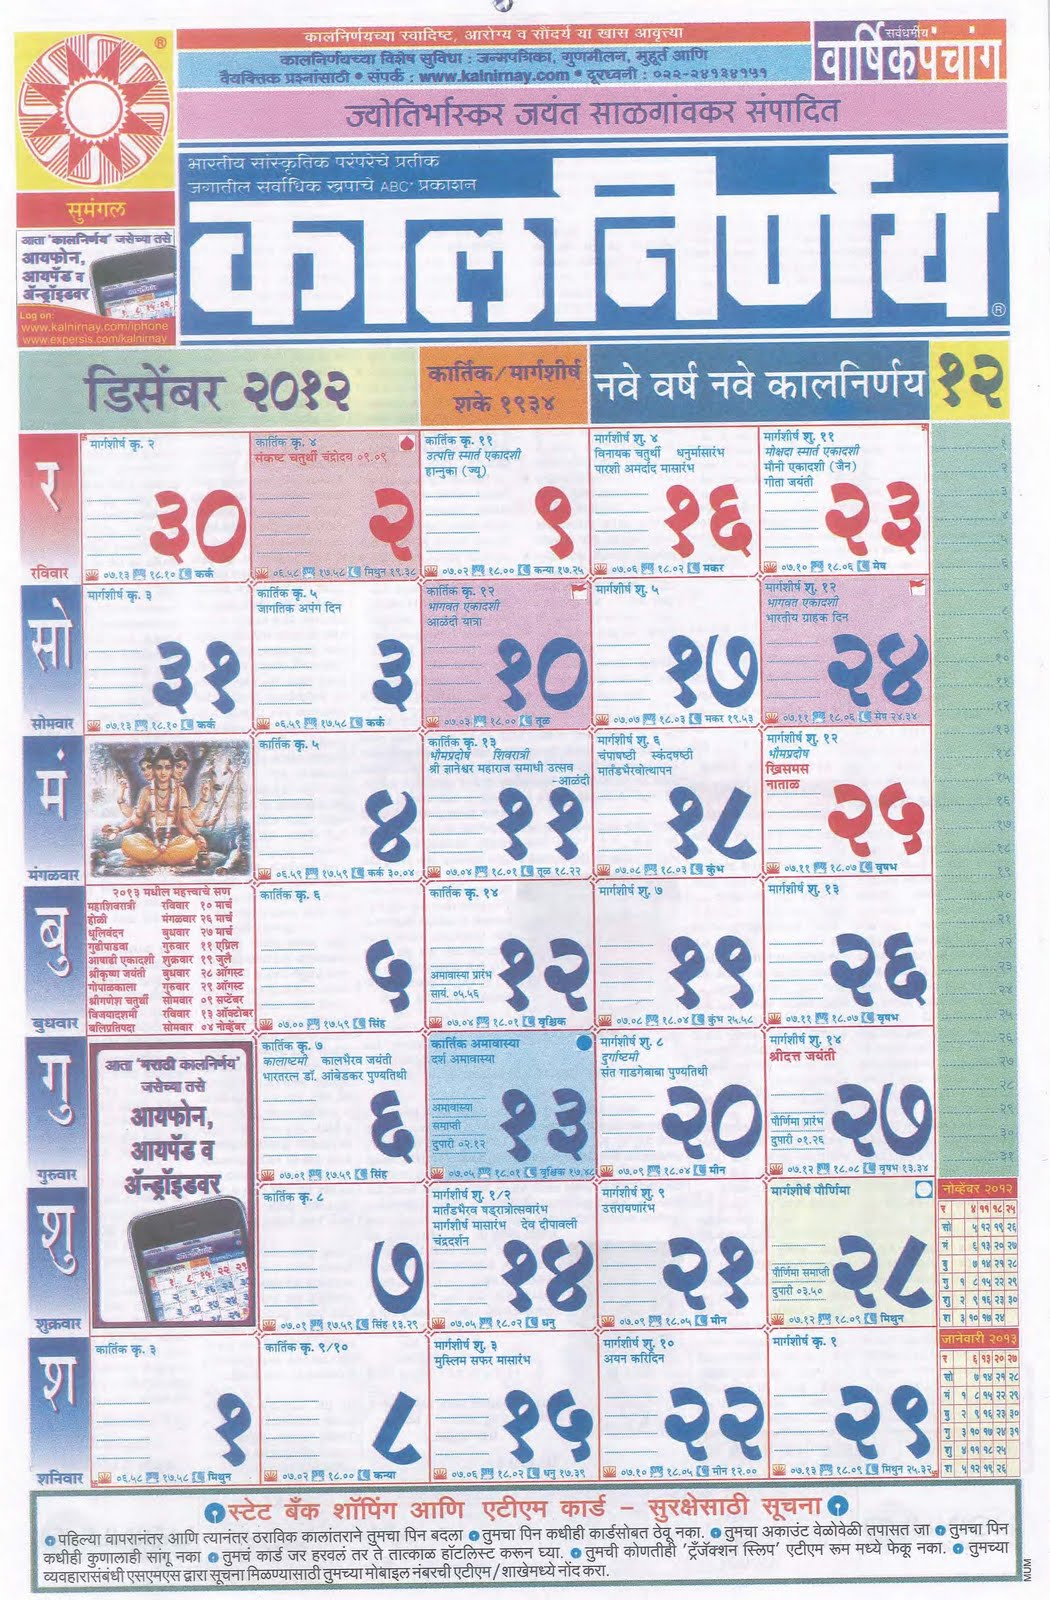 New Year Calendar Kalnirnay : Kalnirnay calendar english new template site